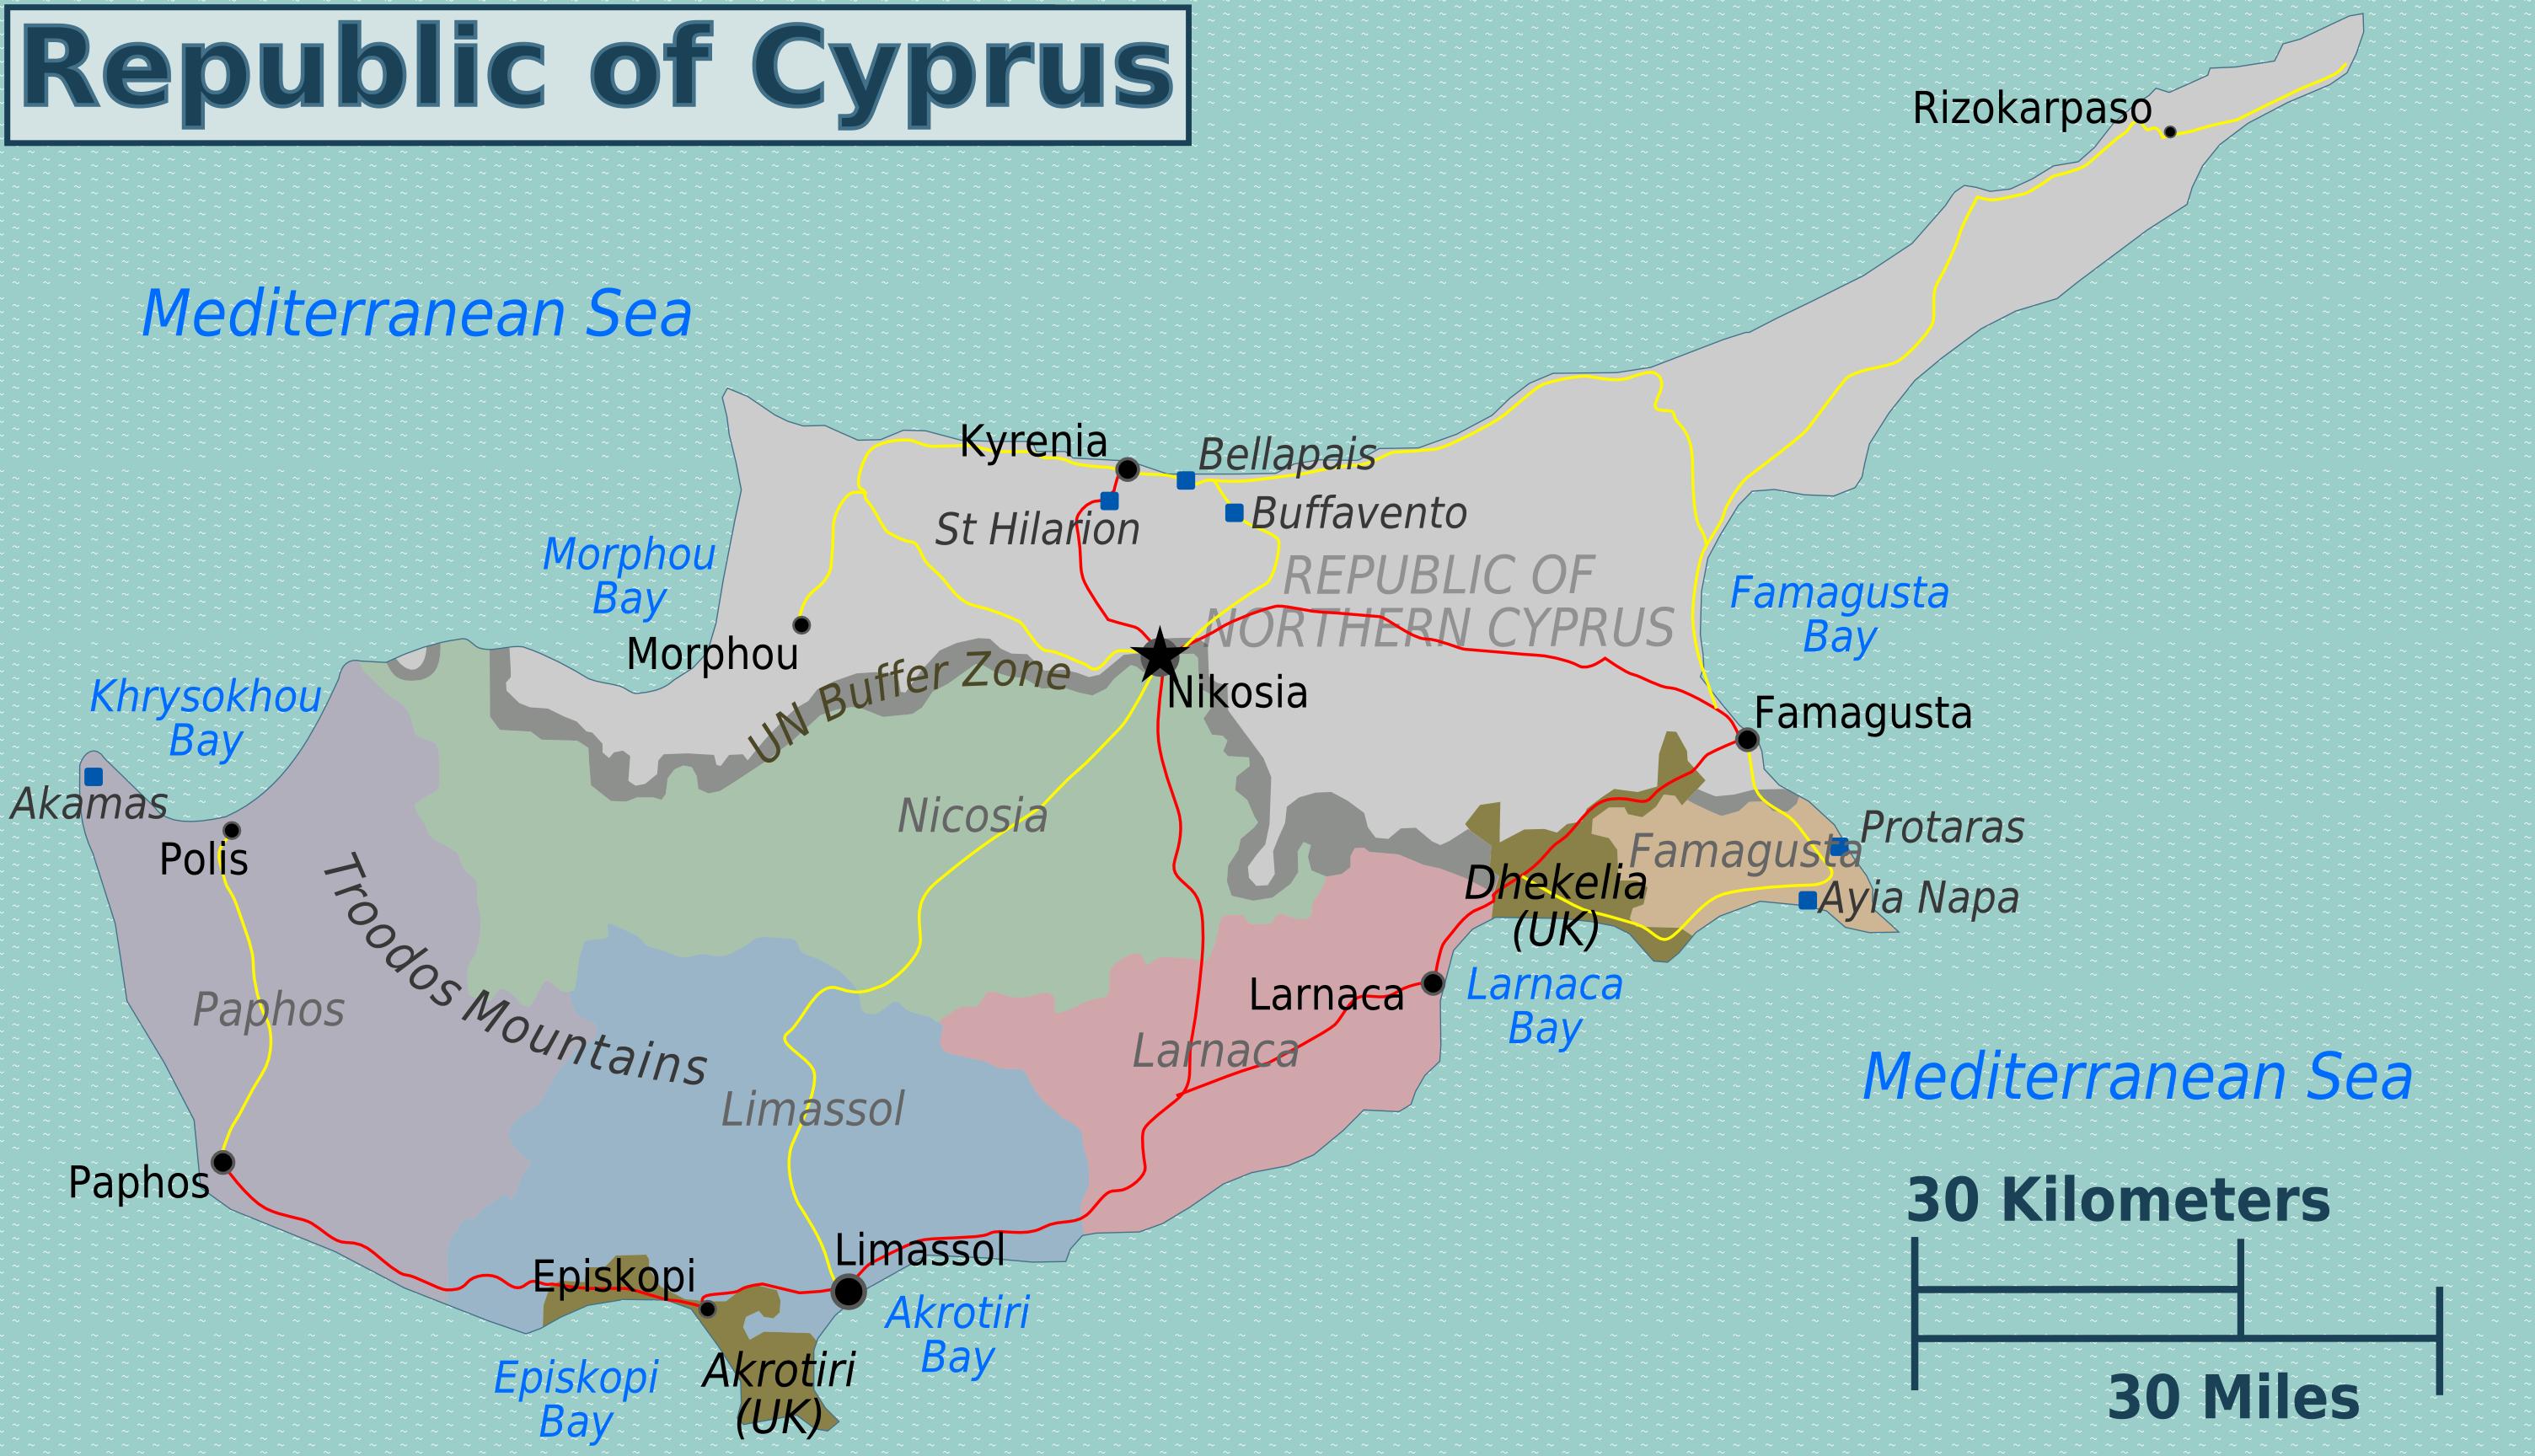 zypern weltkarte Landkarte Zypern (Karte Regionen) : Weltkarte.  Karten und  zypern weltkarte